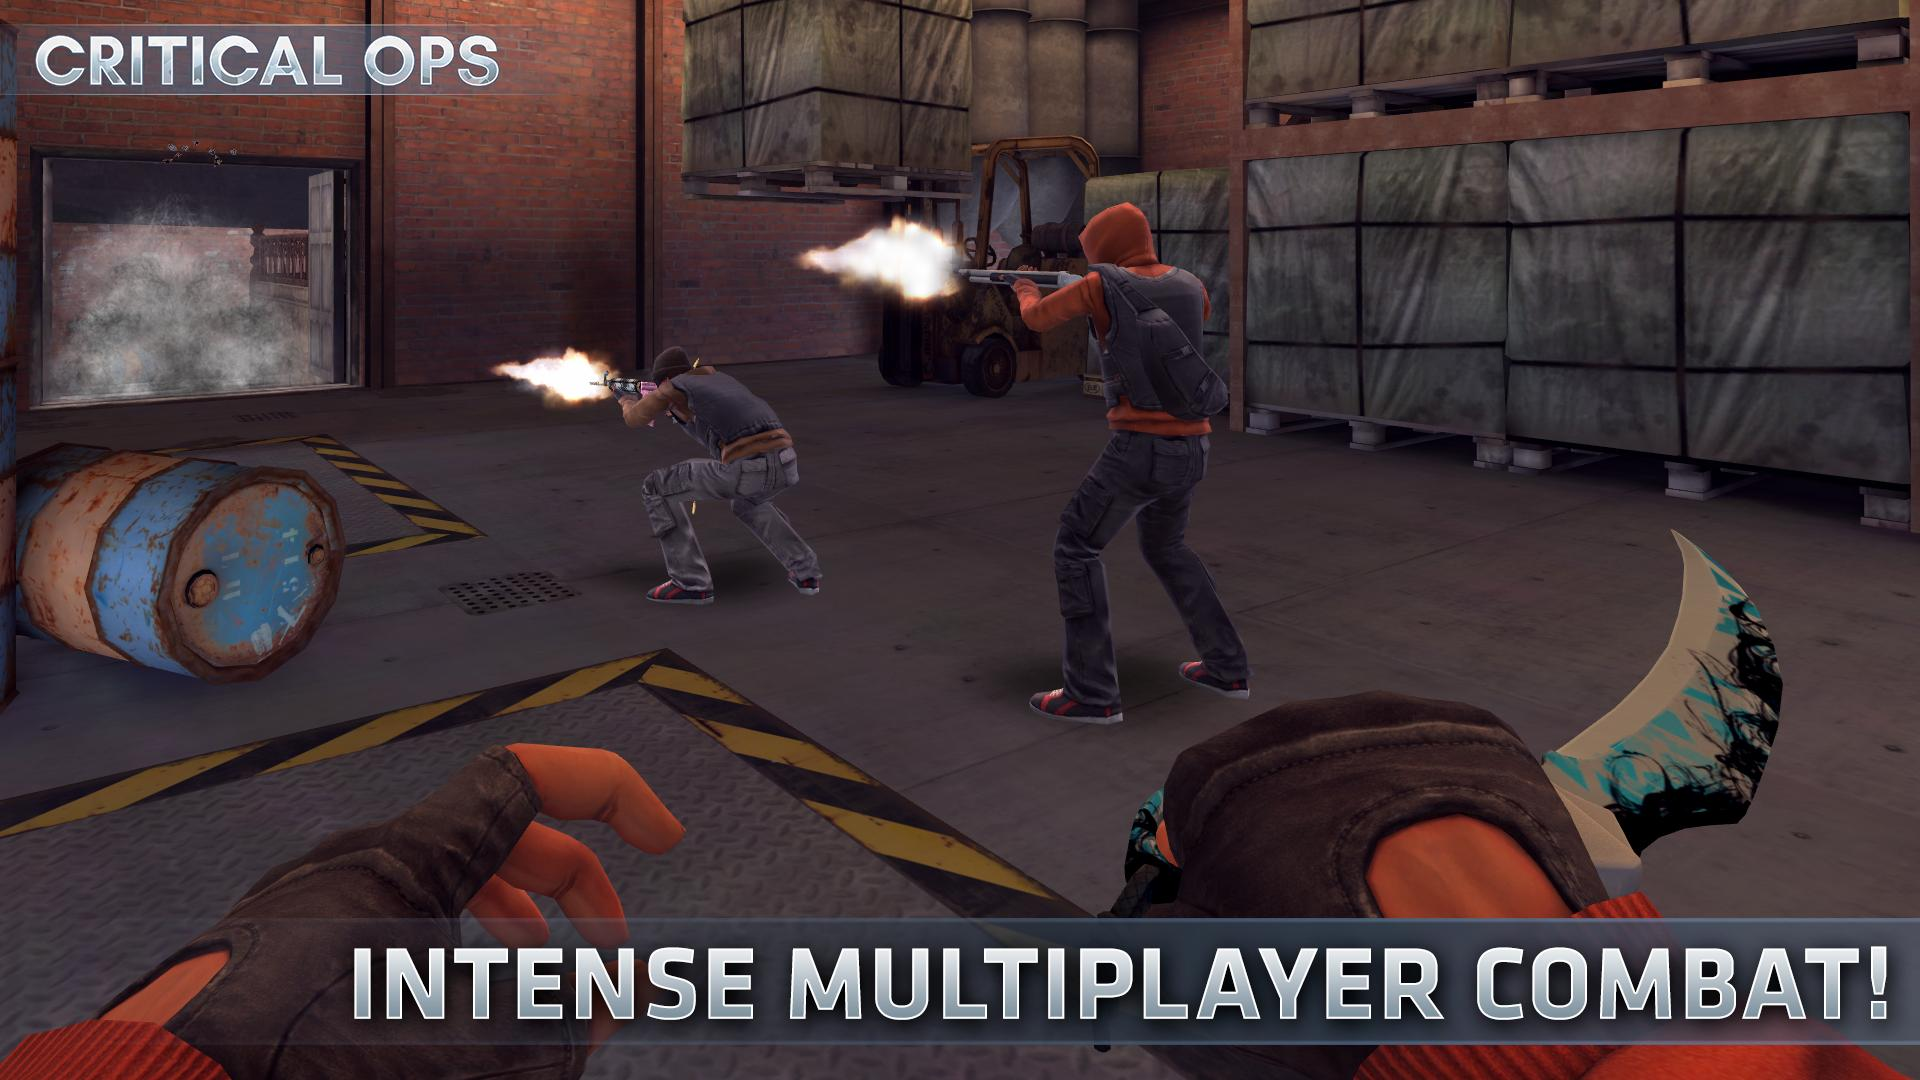 Critical Ops Multiplayer FPS 1.21.0.f1253 Screenshot 8